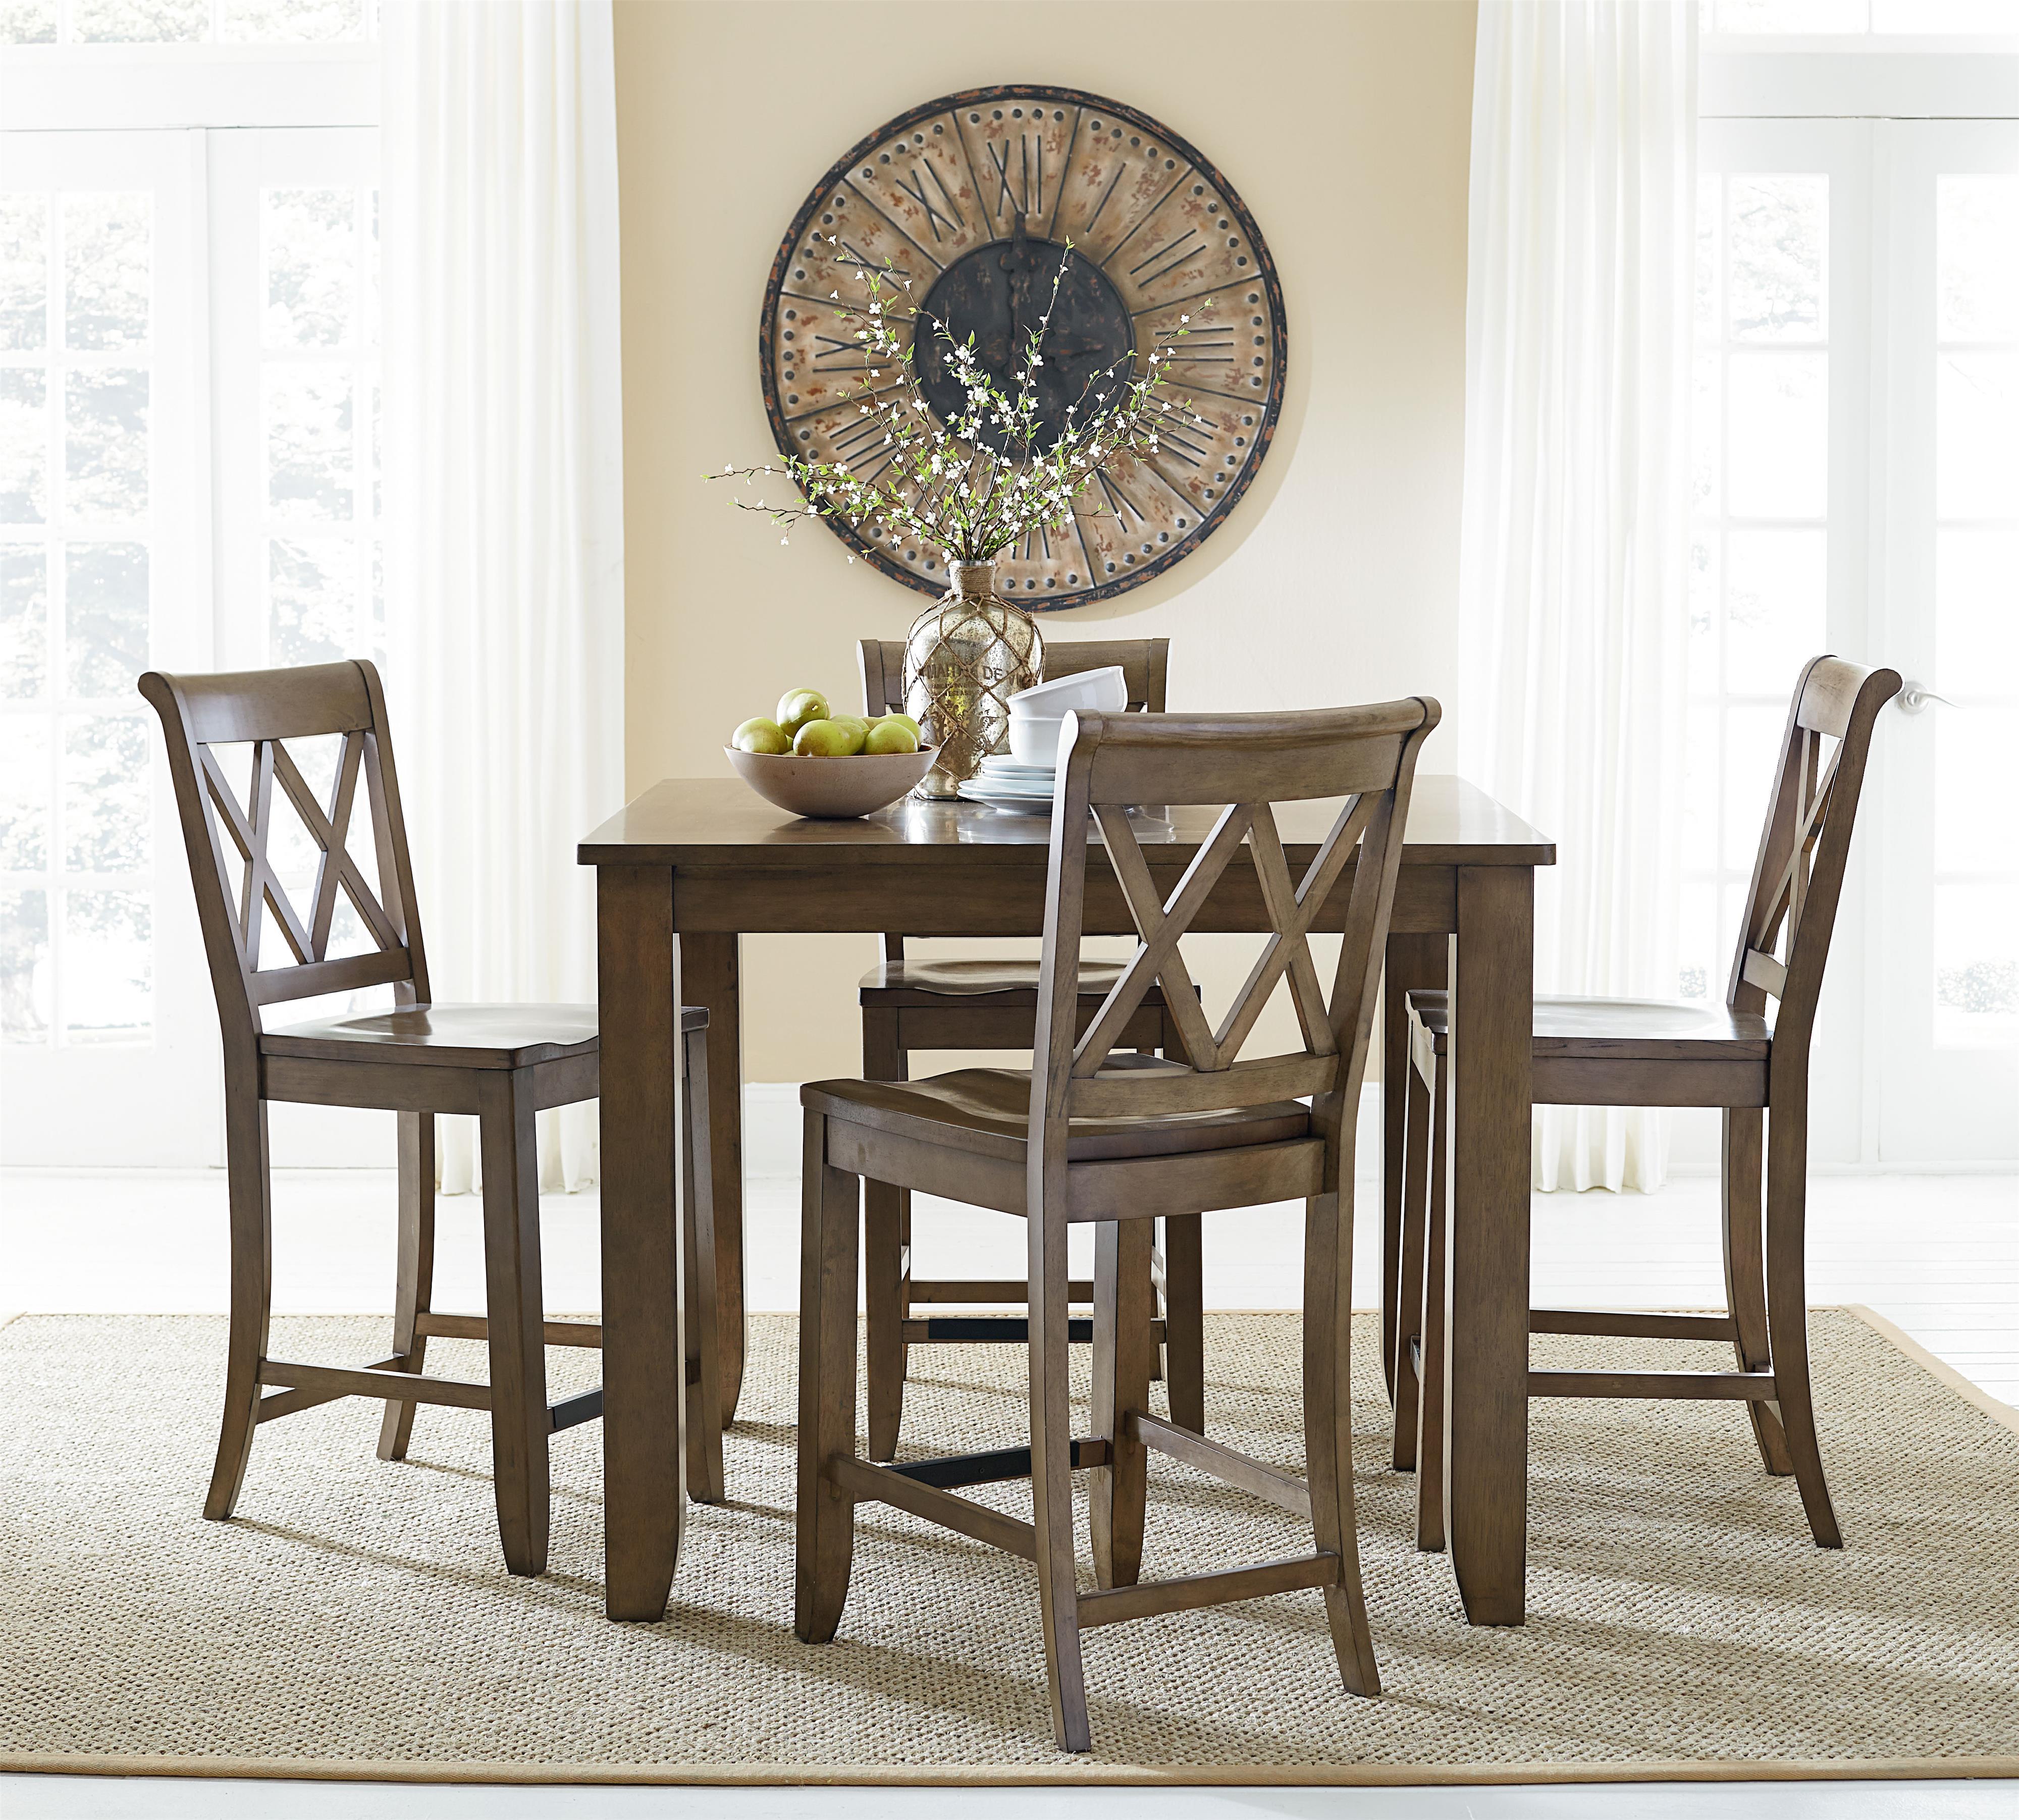 standard furniture vintage vanilla counter height stool with x back jacksonville furniture. Black Bedroom Furniture Sets. Home Design Ideas